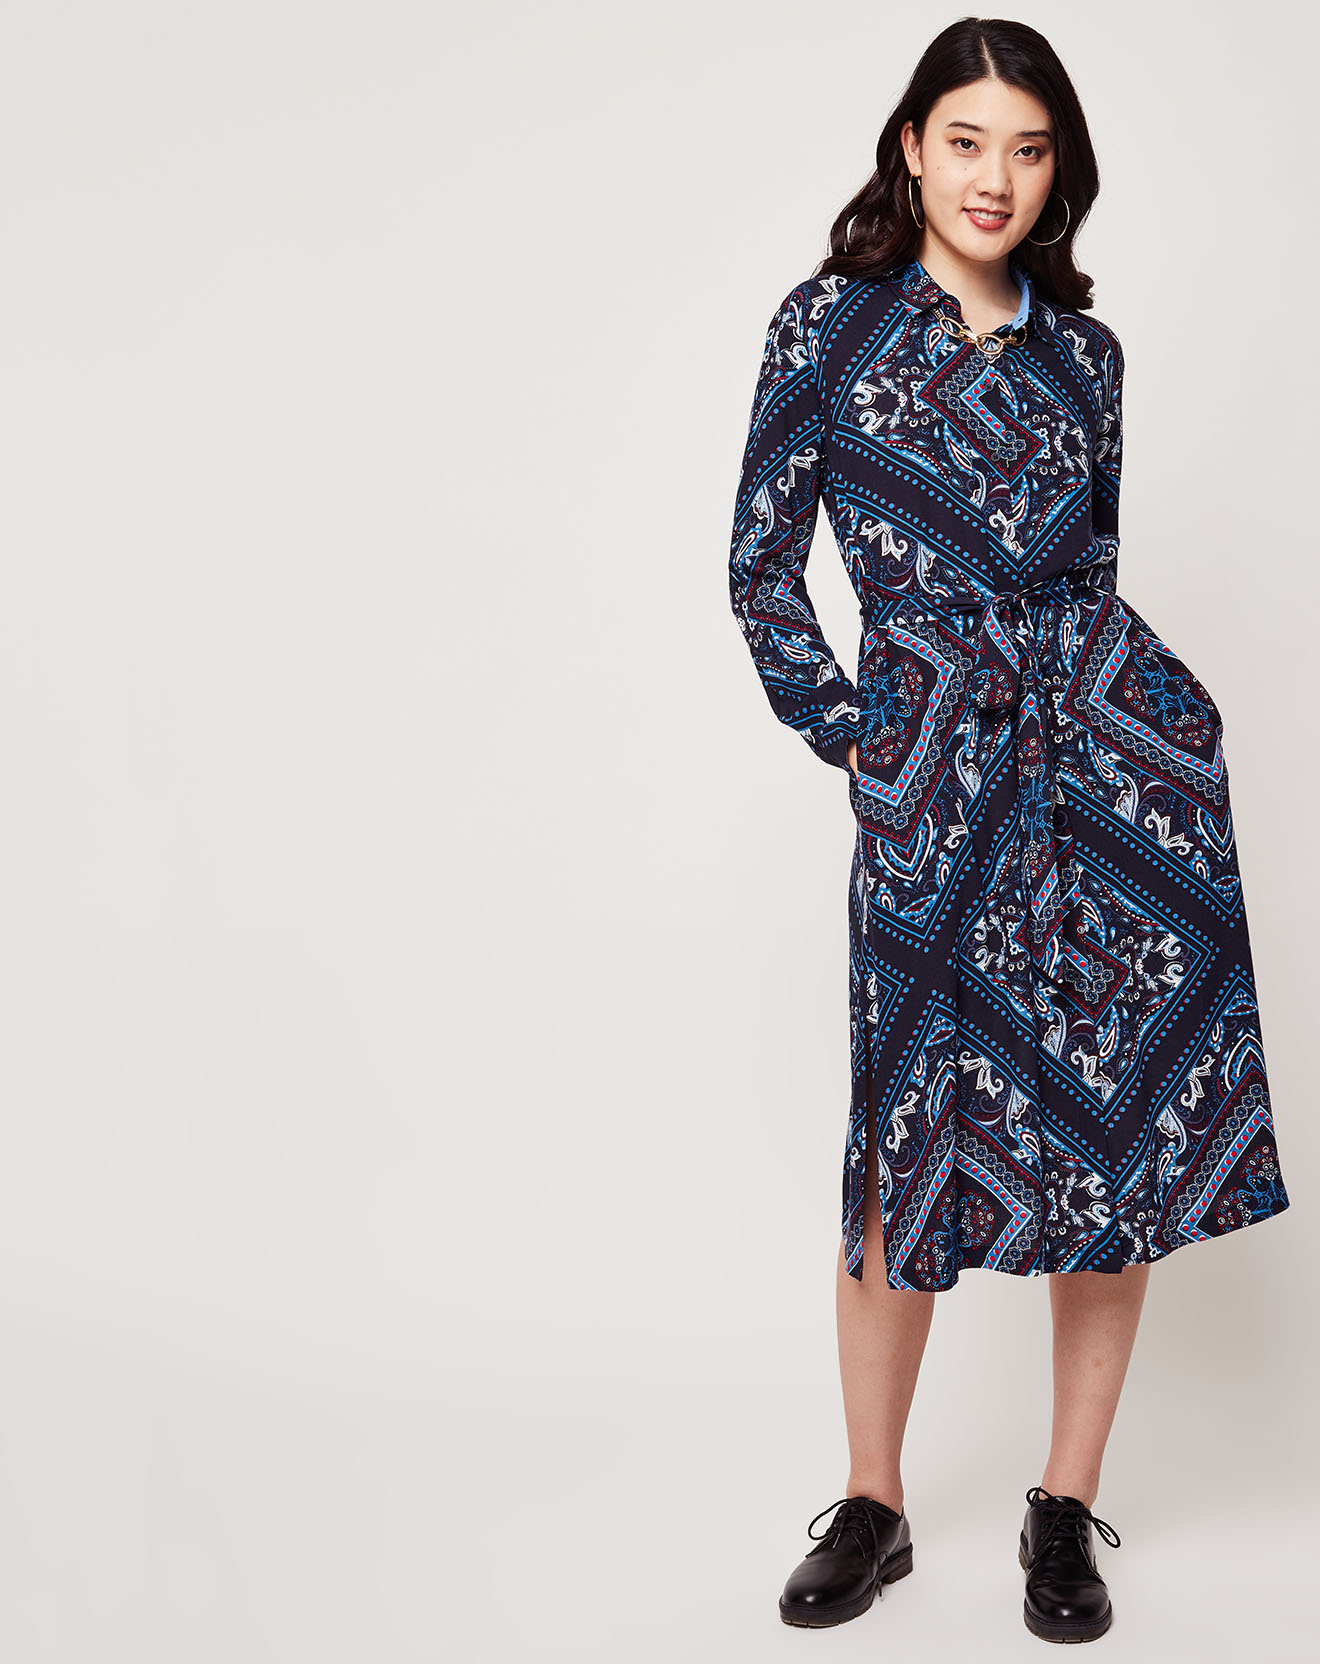 Robe imprimée cachemire bleu marine - Esprit - Modalova